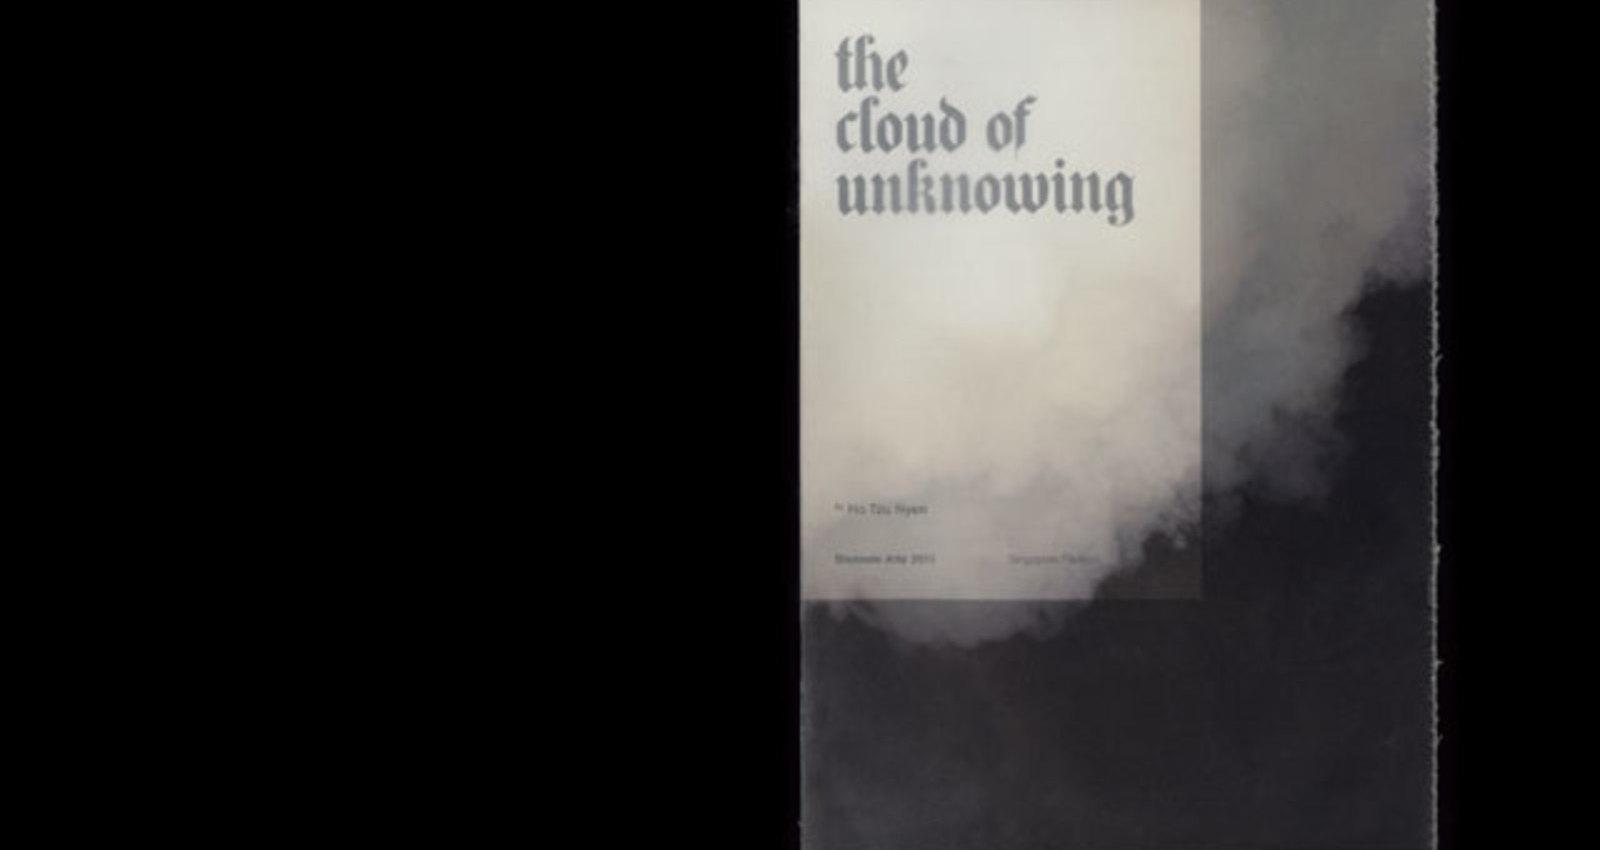 'Cloud of Unknowing' - Venice Biennale 2011